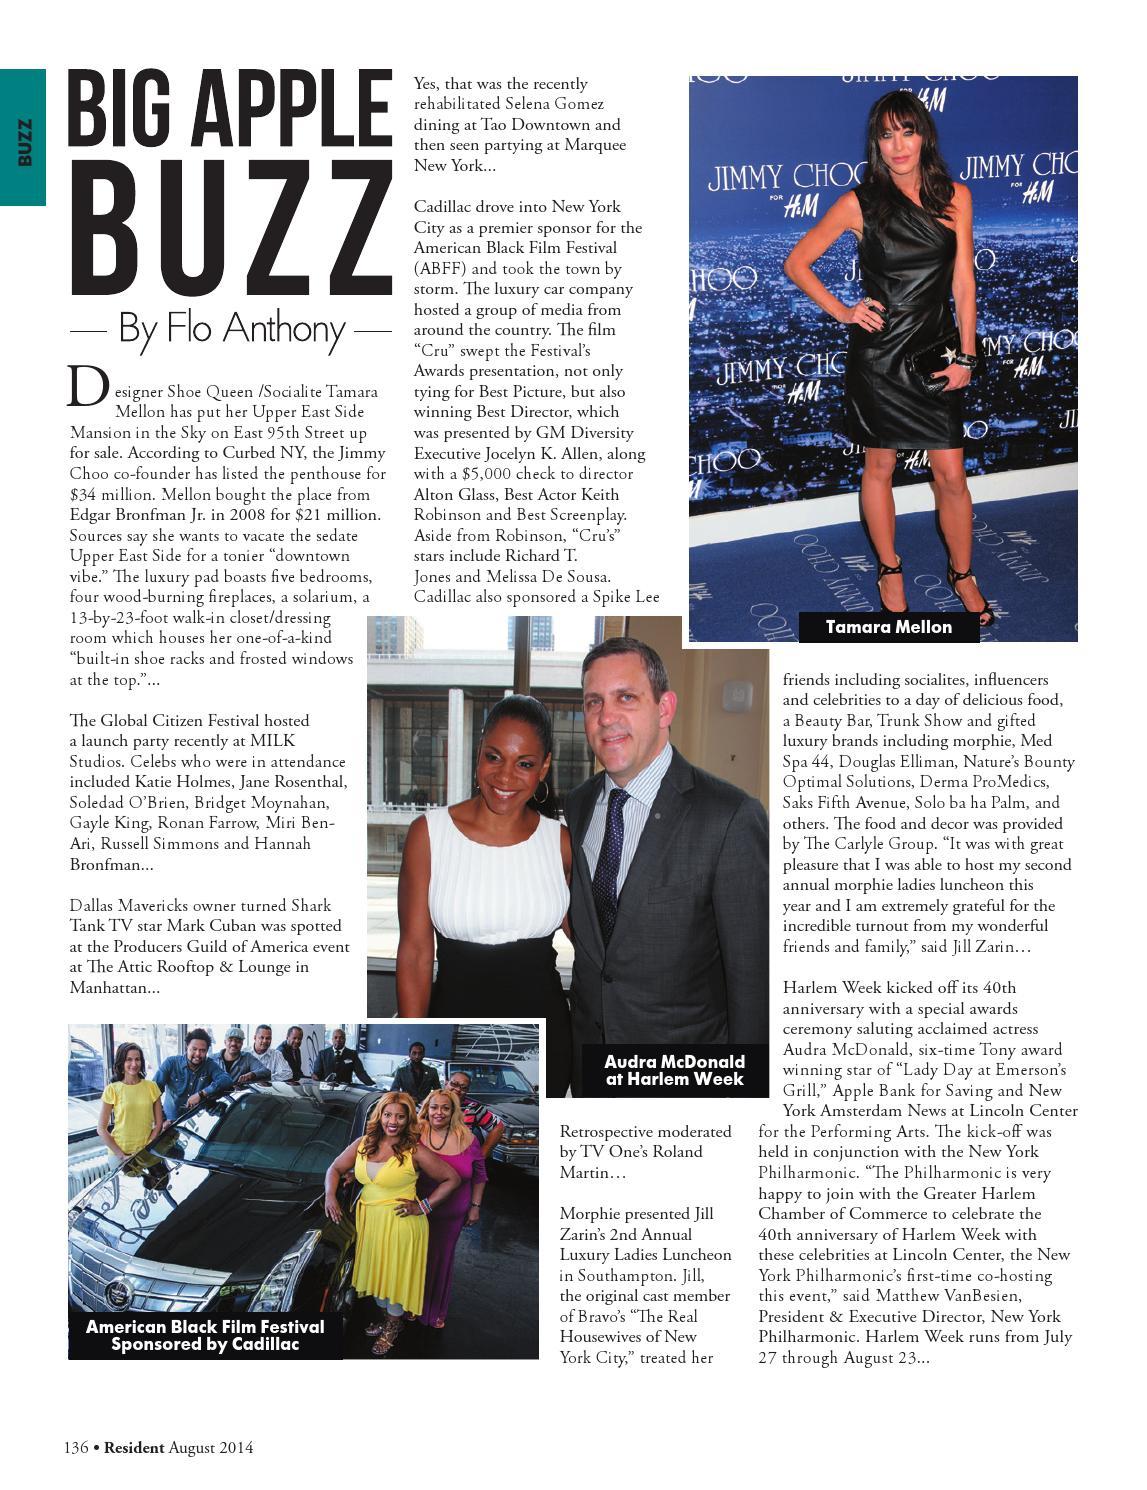 Resident Magazine August 2014 by Resident Magazine - issuu